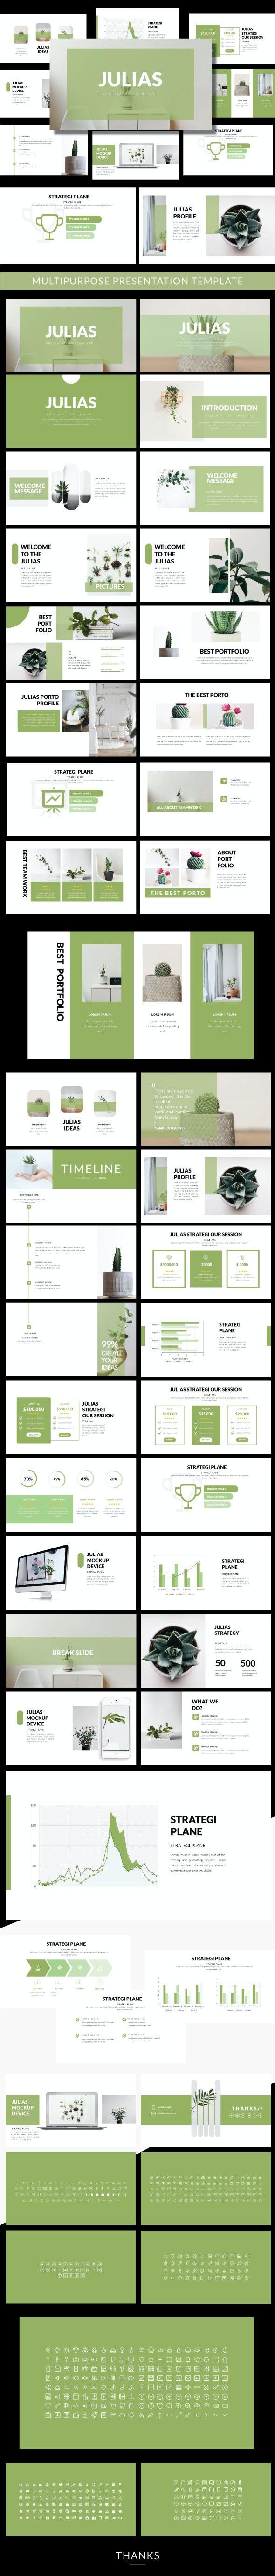 Julias - Creative Presentation - Business PowerPoint Templates